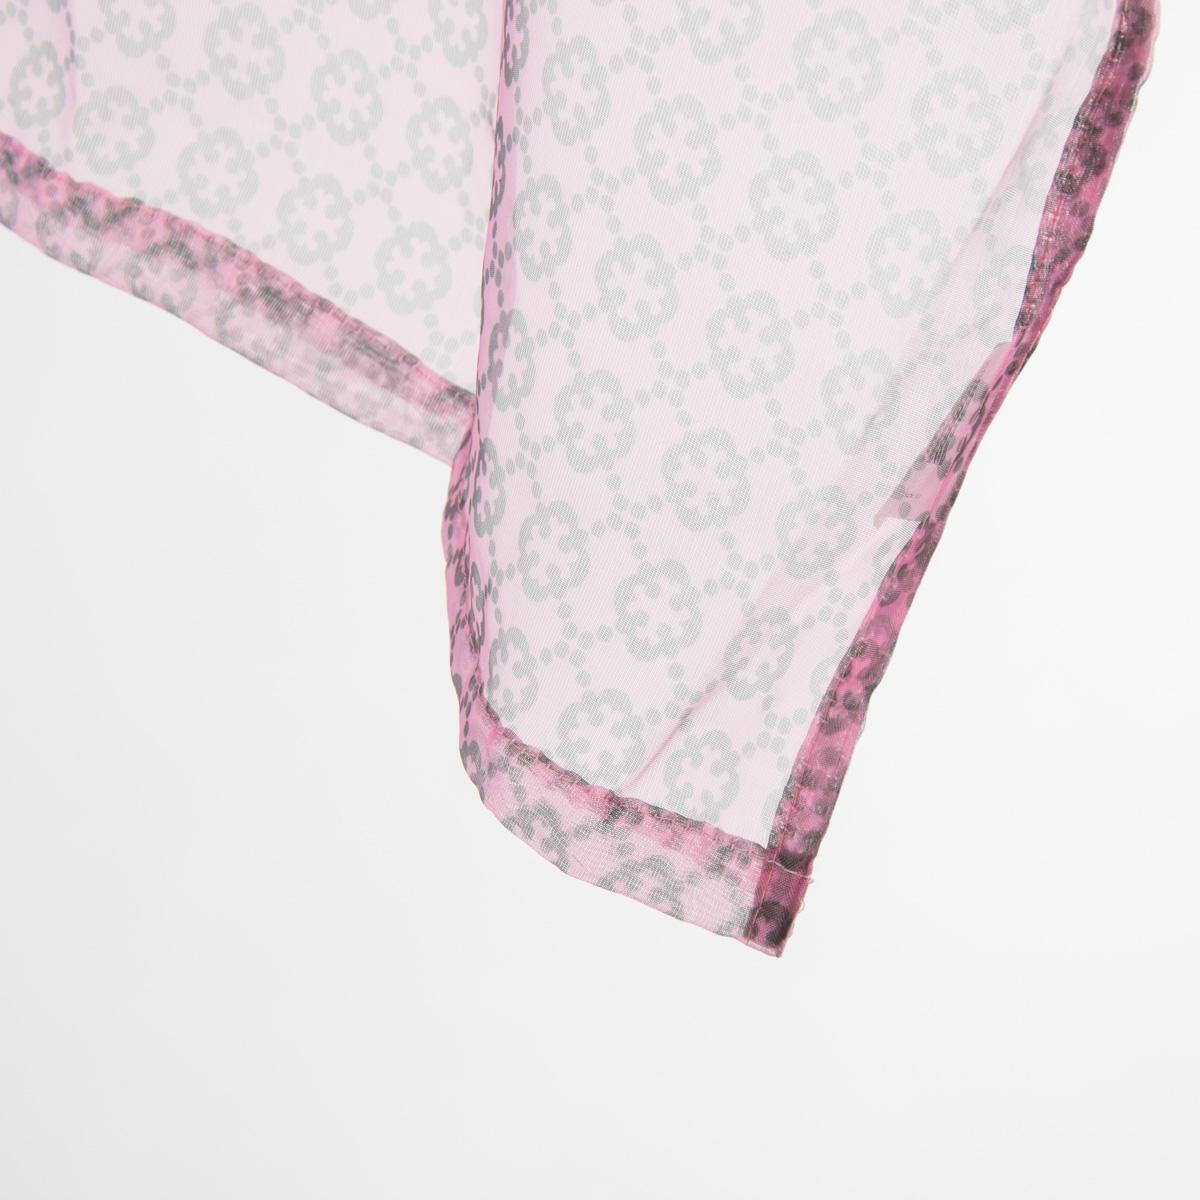 fertiggardine sengardine voile rosa grau muster 135x260cm gardinen fertiggardinen senschals. Black Bedroom Furniture Sets. Home Design Ideas